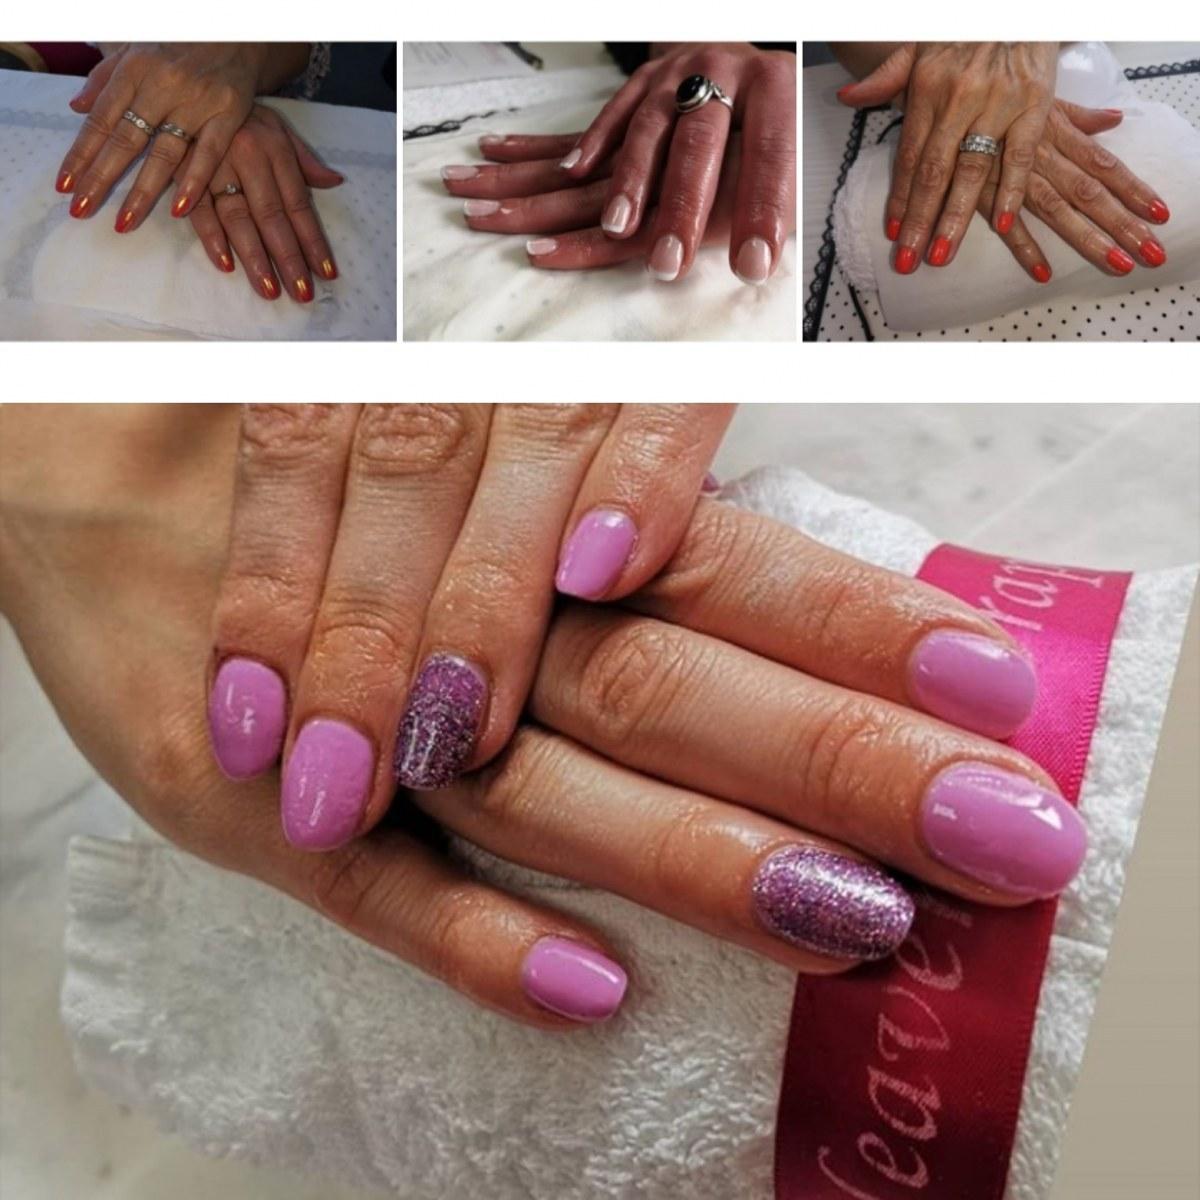 Gel Nails  at Heaven Therapy Nail Salon, Cullercoats, North Shields